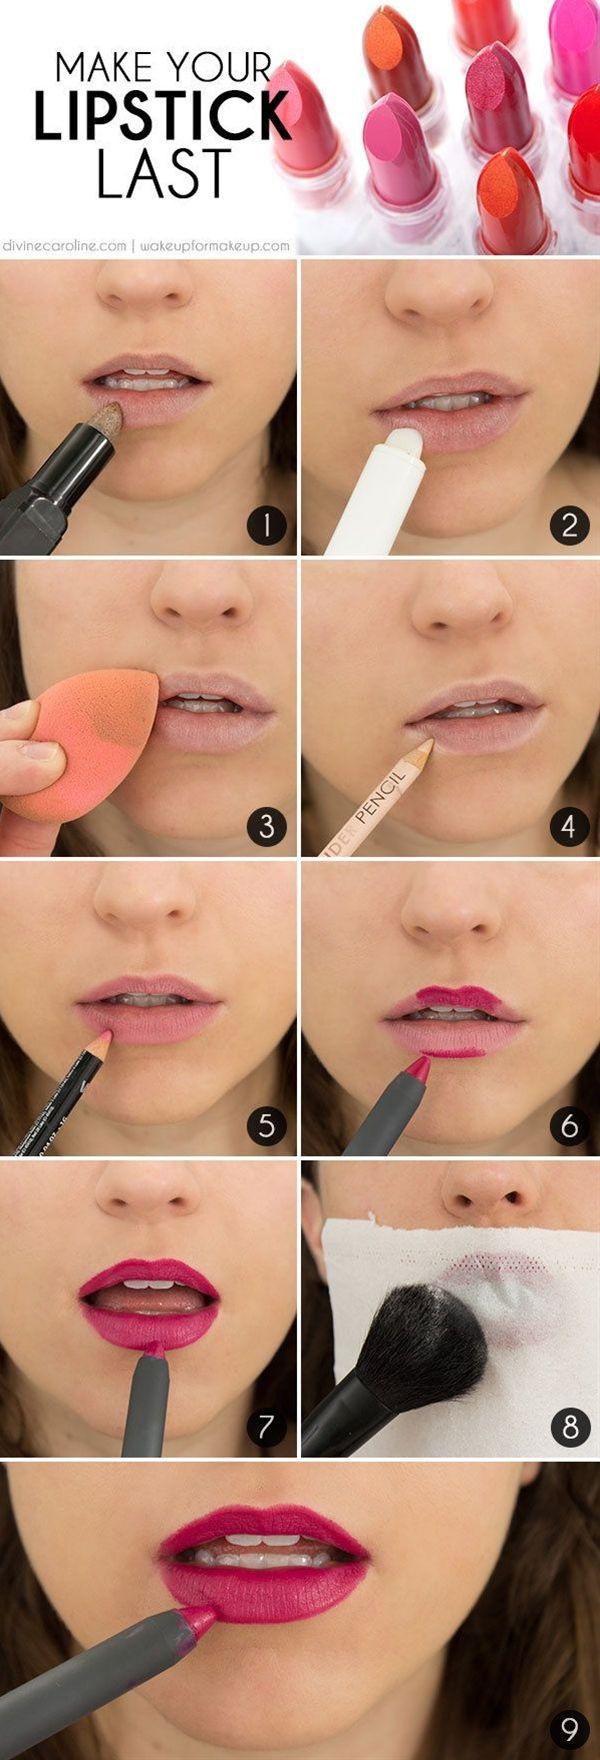 Make Your Lip Color Last: The Secret to Long-Lasting Lipstick